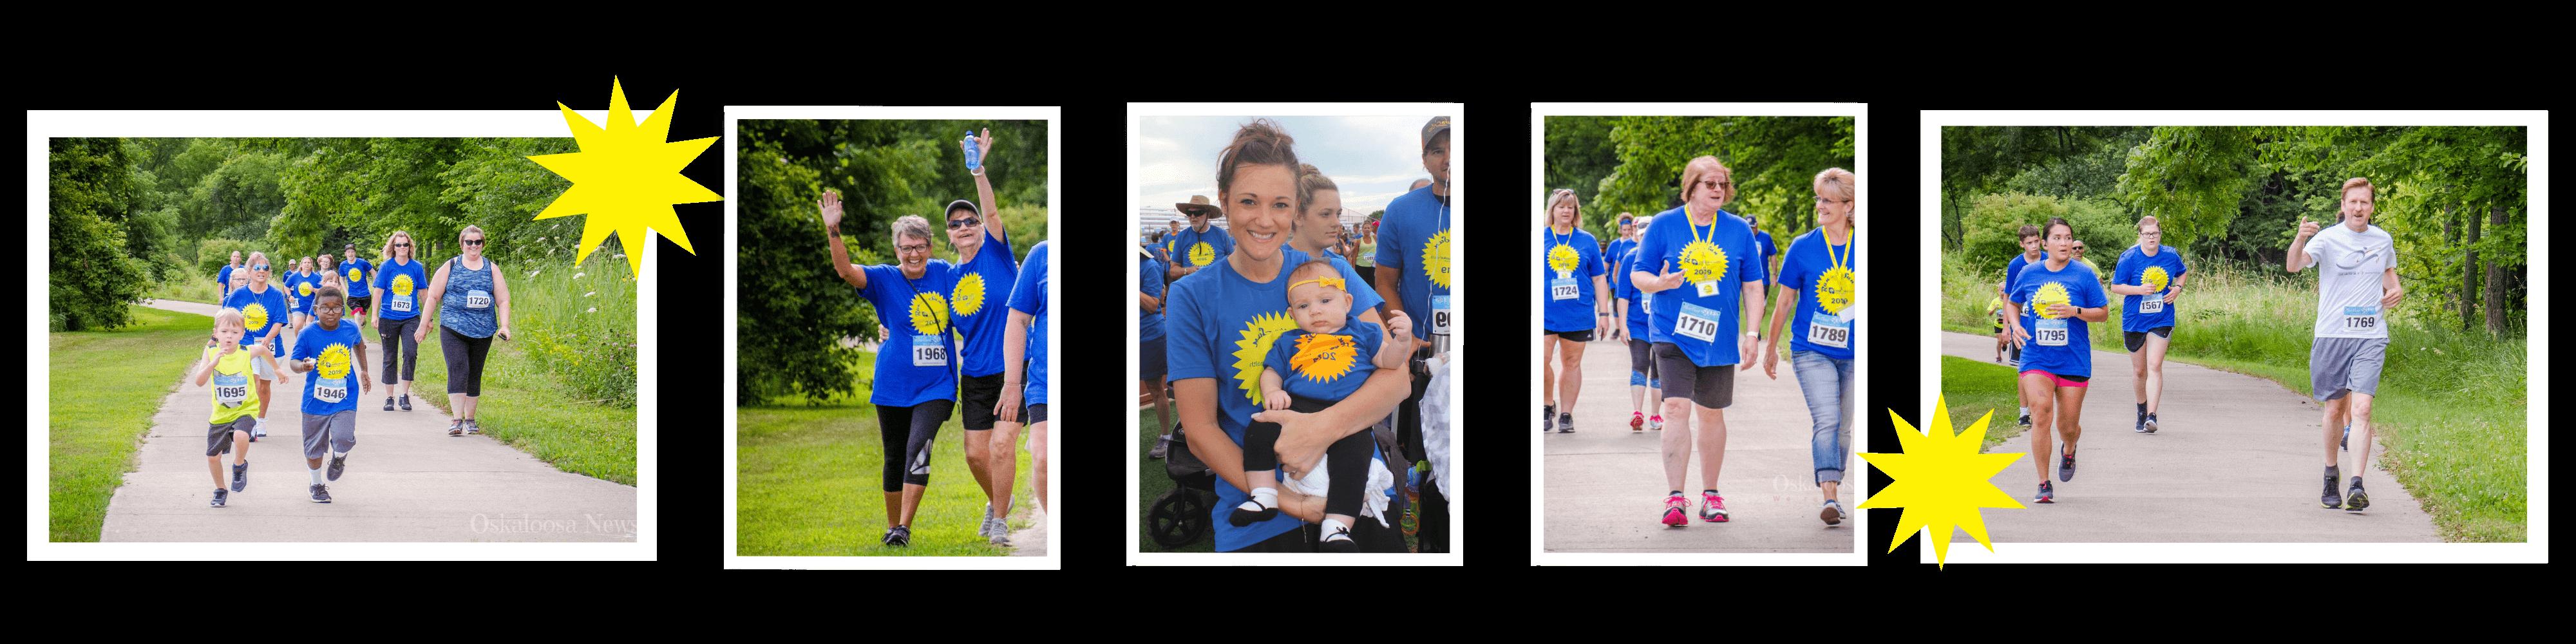 10th Annual Run In The Sun 2021! 1